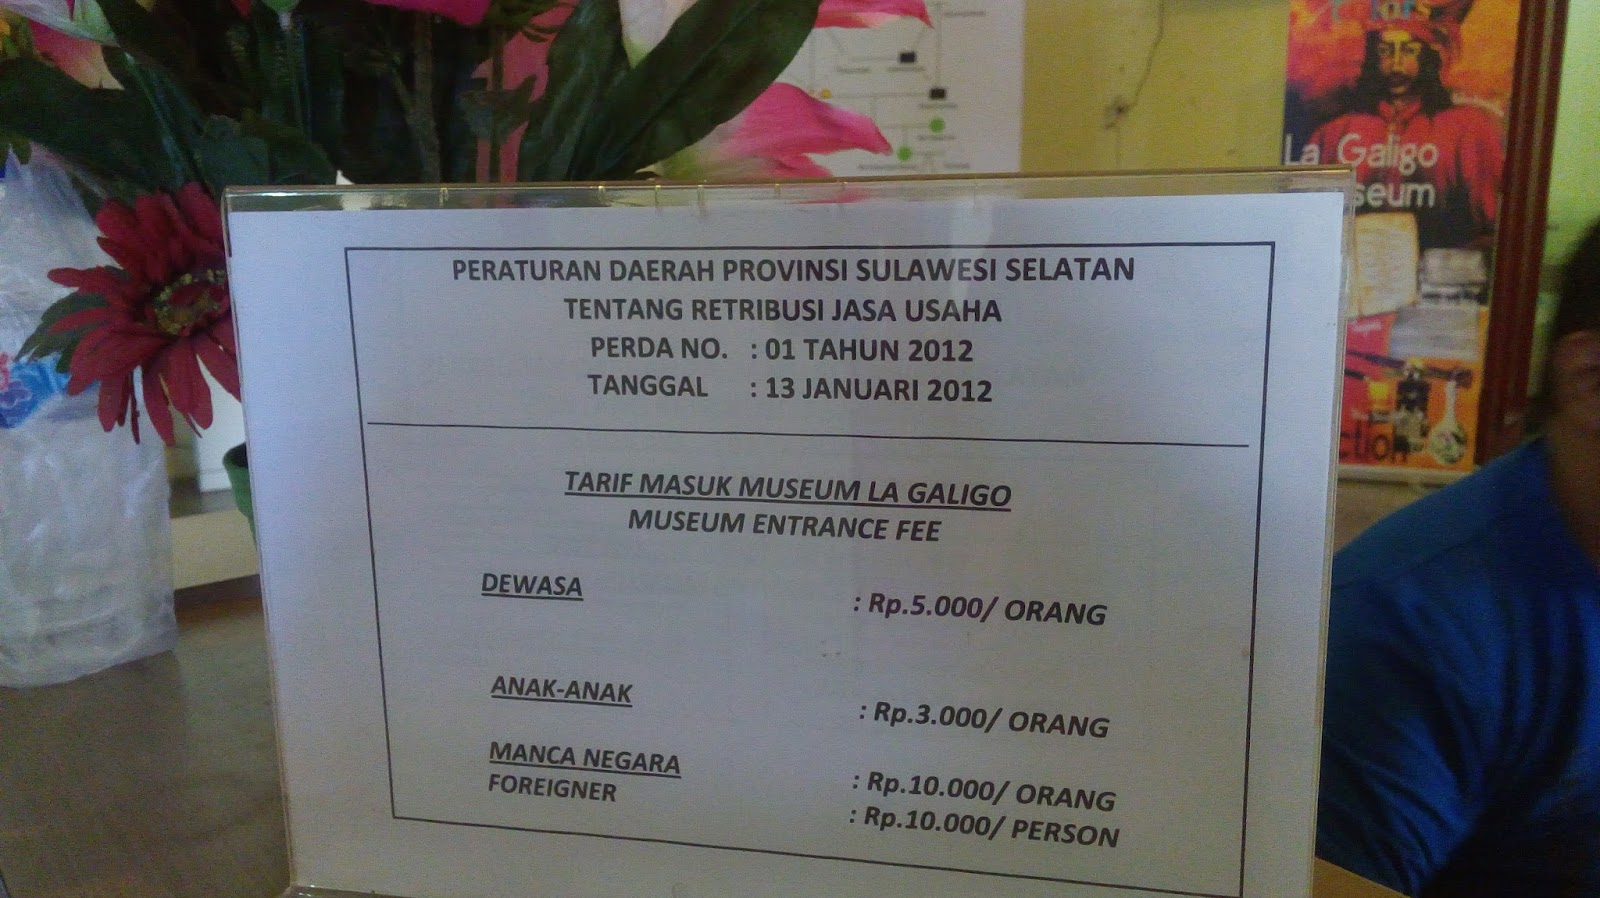 Optimalisasi Fungsi Penting Museum La Galigo Makassar Sebagai Gambar 2